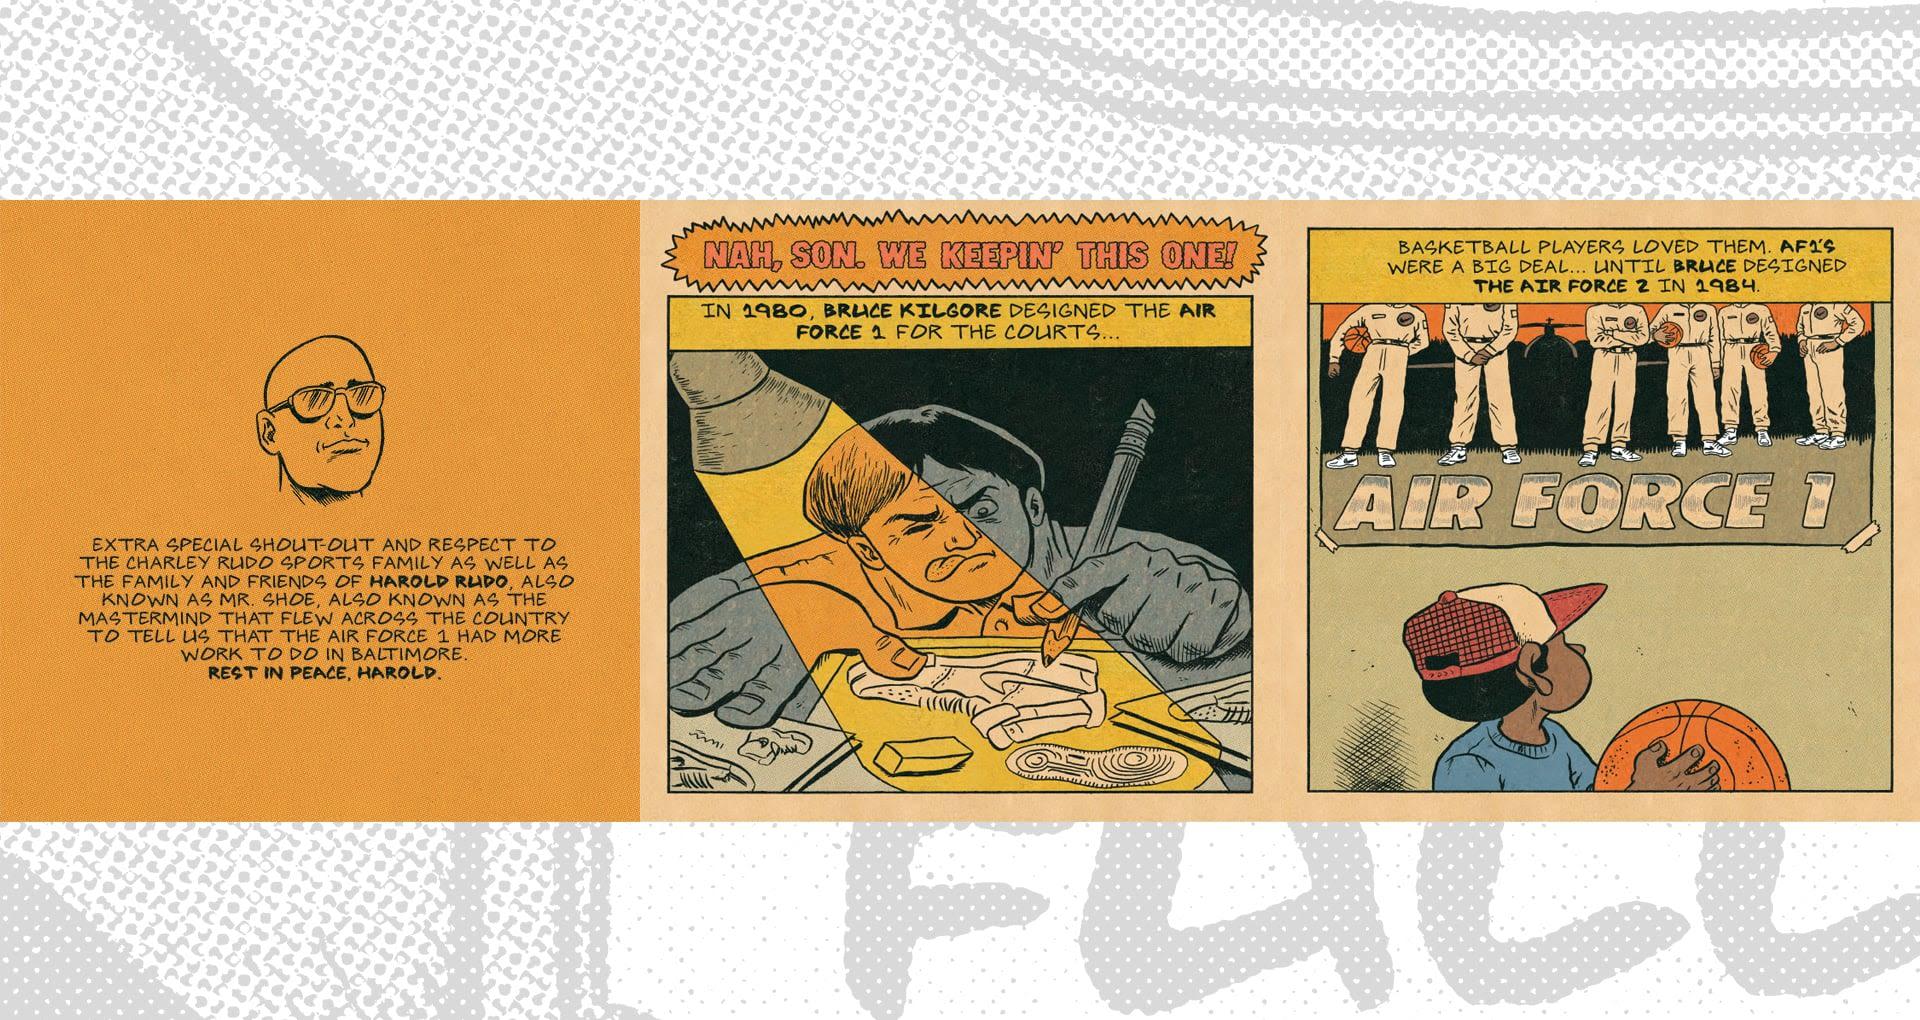 Dimension 6 Comics: Air Force 1 Baltimore '84. Nike SNKRS